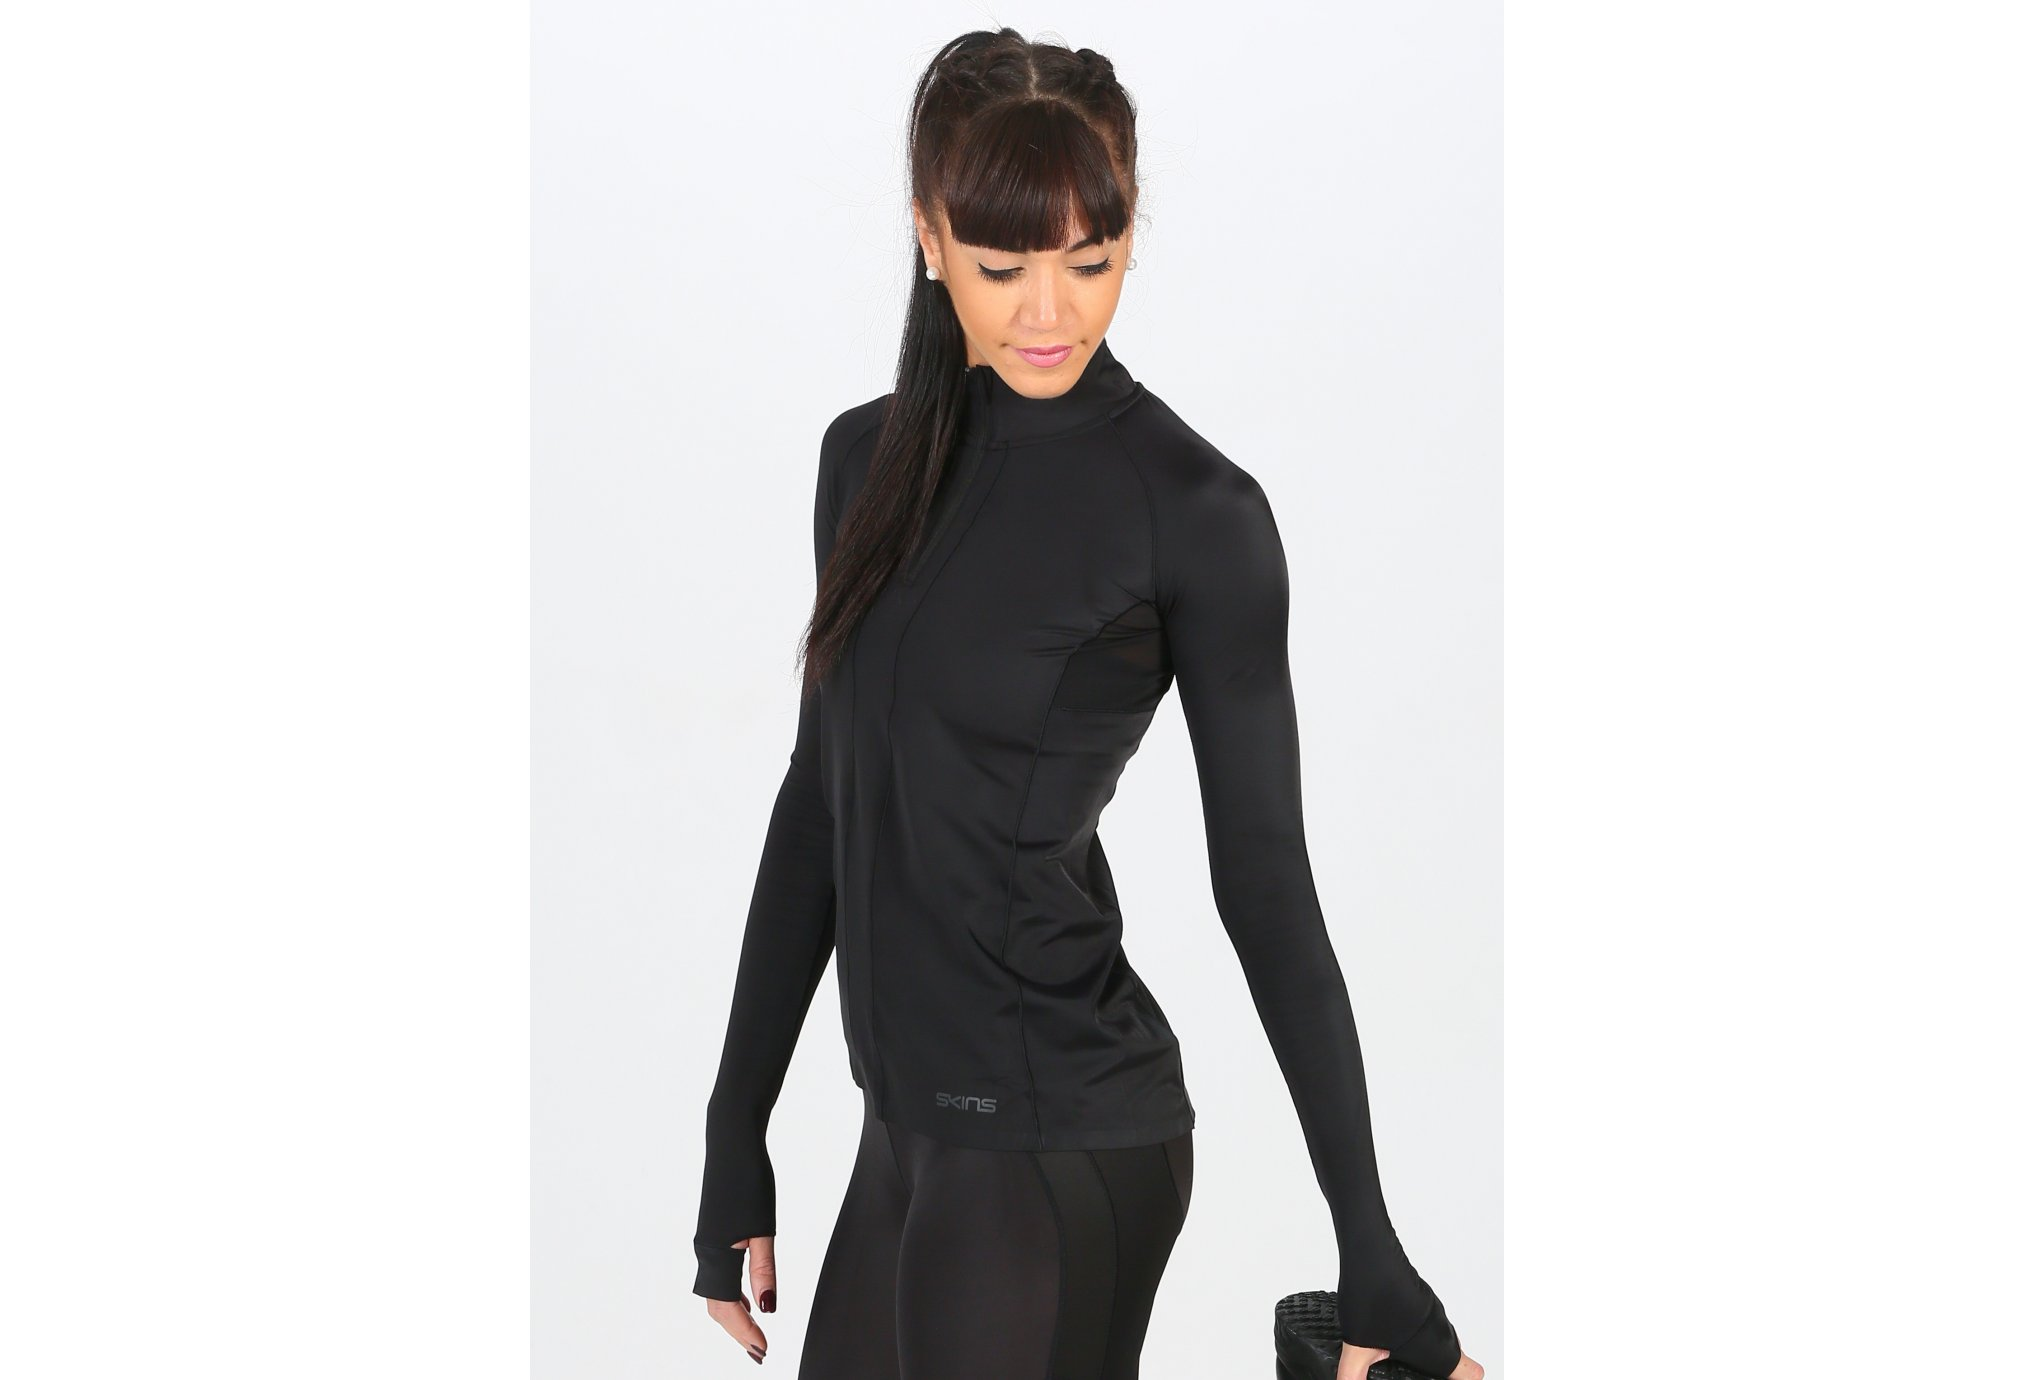 Skins DNAmic Ultimate 1/4 Zip W vêtement running femme